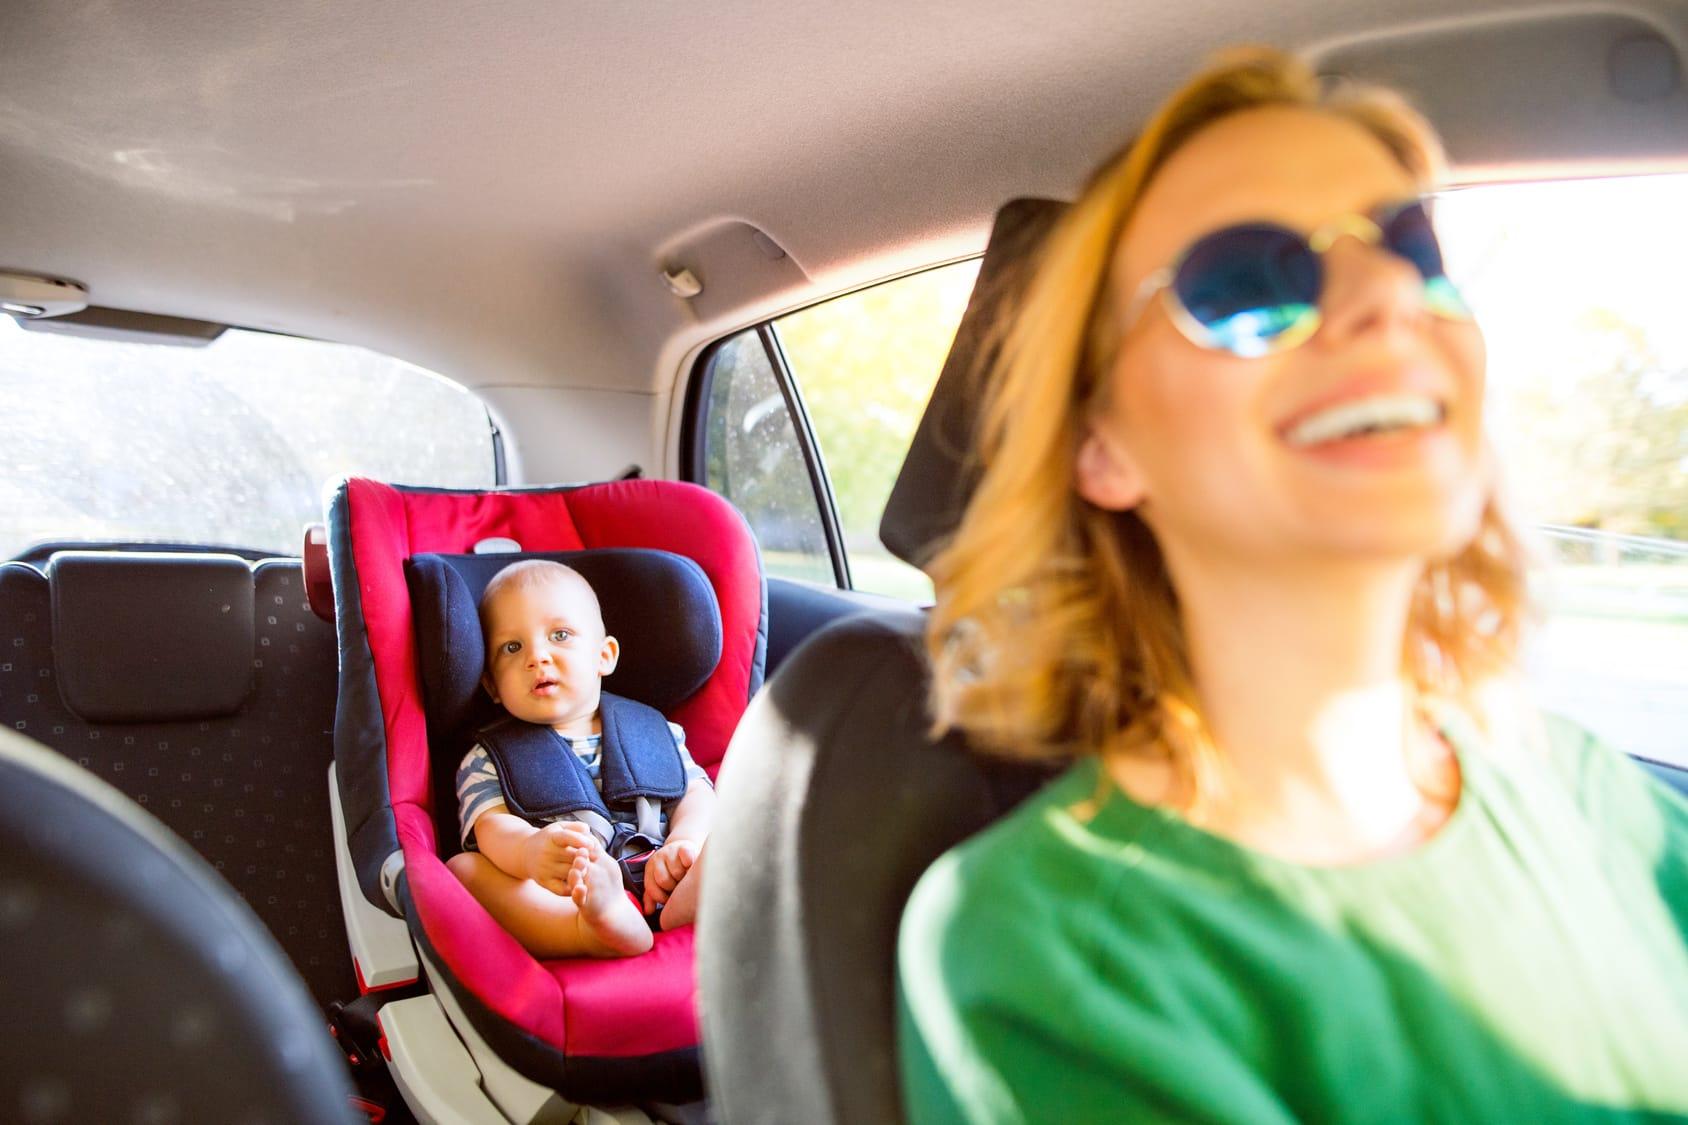 Autopolster Reinigen 7 Tipps Tricks Haushaltstippsnet